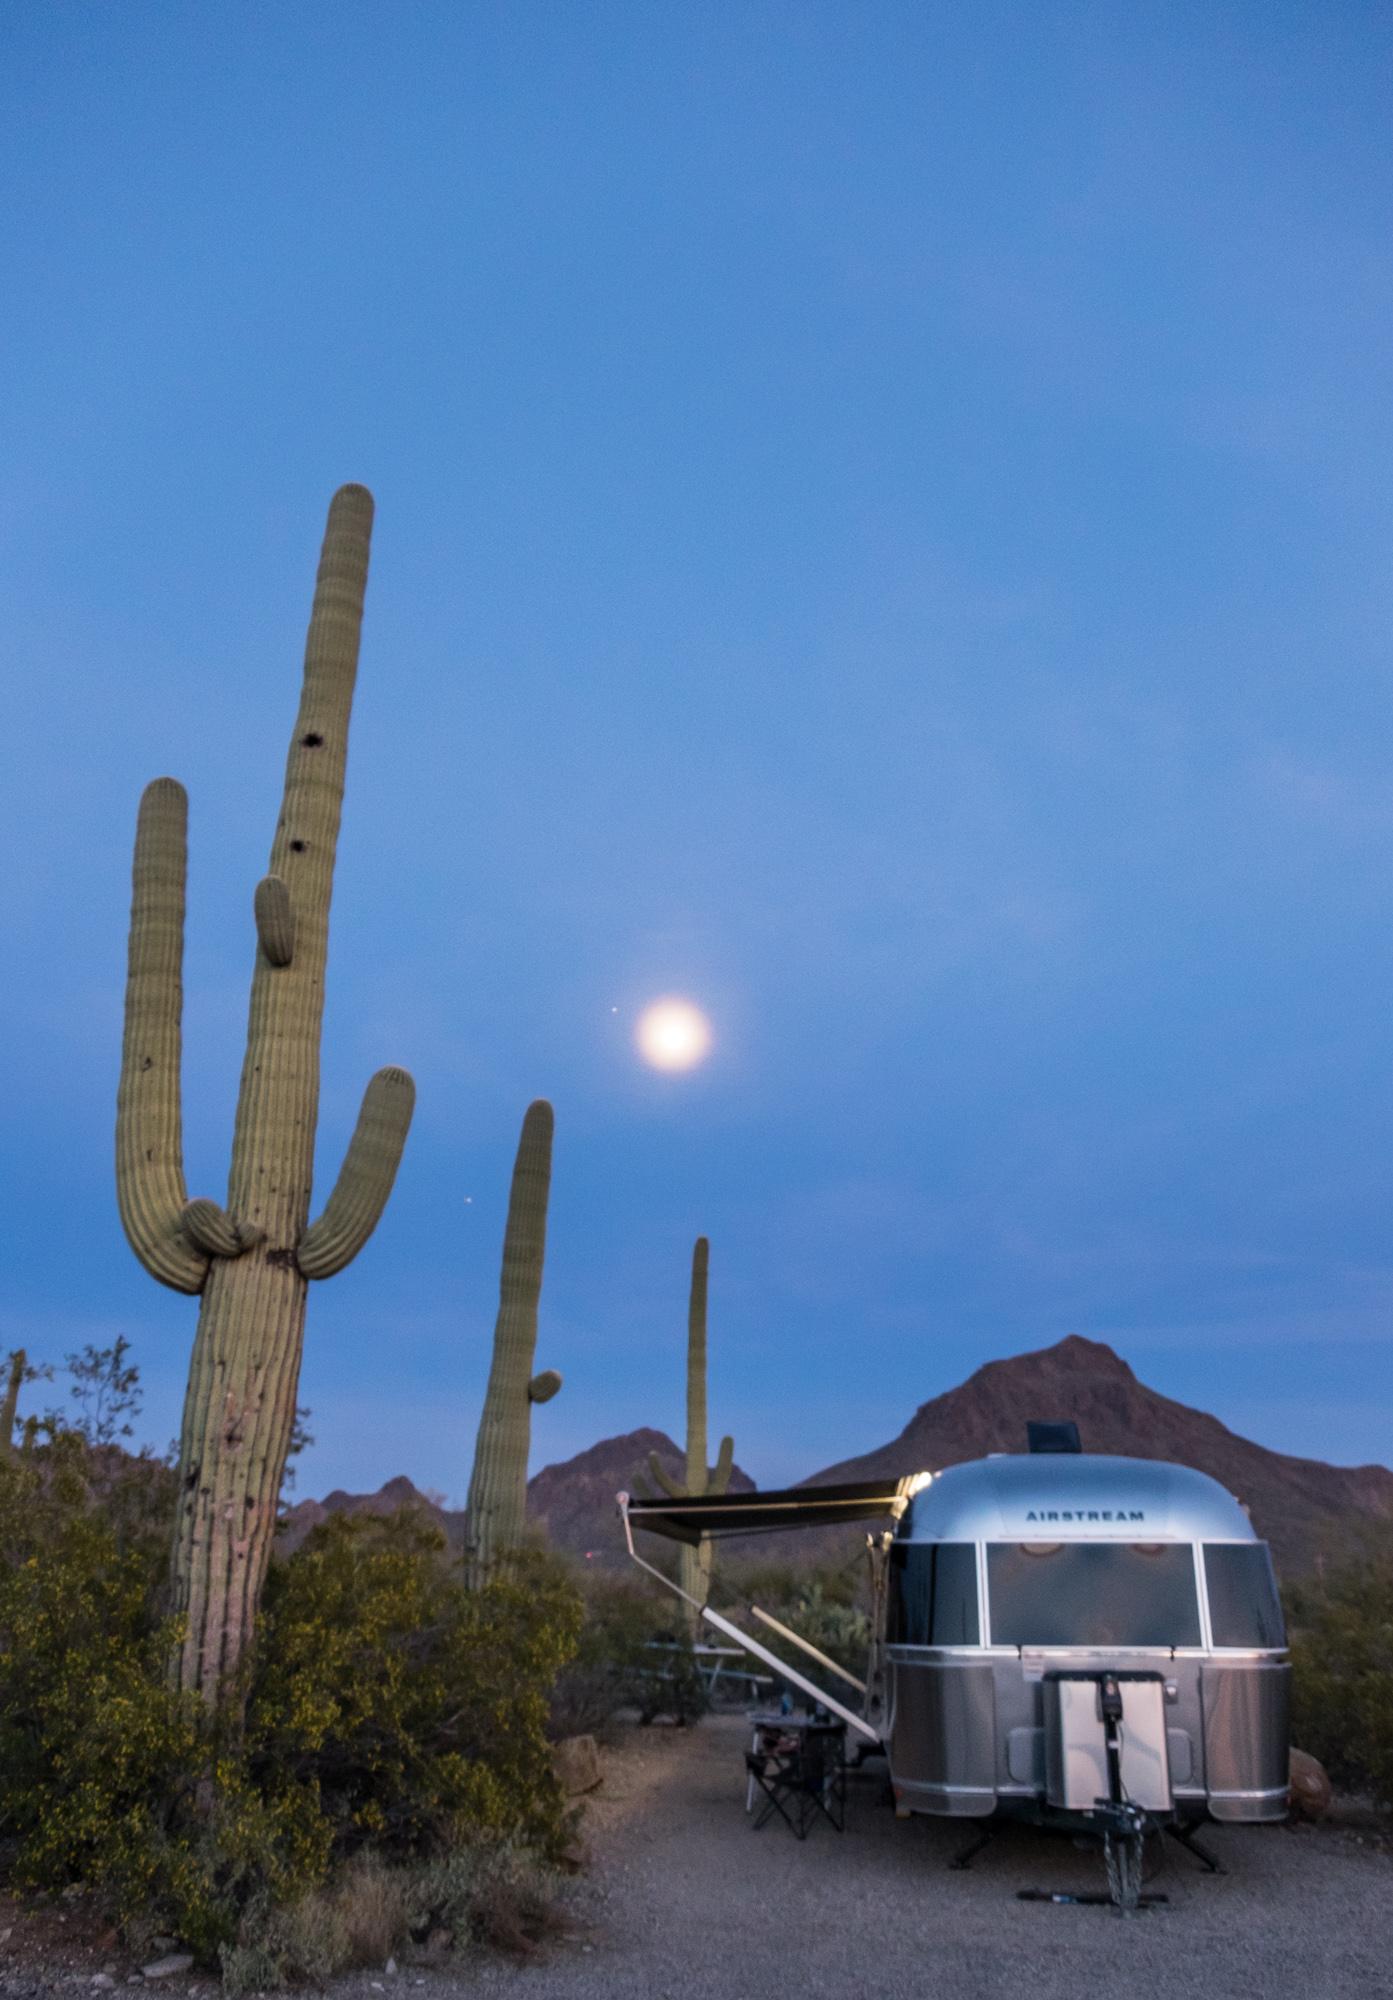 Moon glow above Wally the Airstream at Saguaro National Park in Arizona.